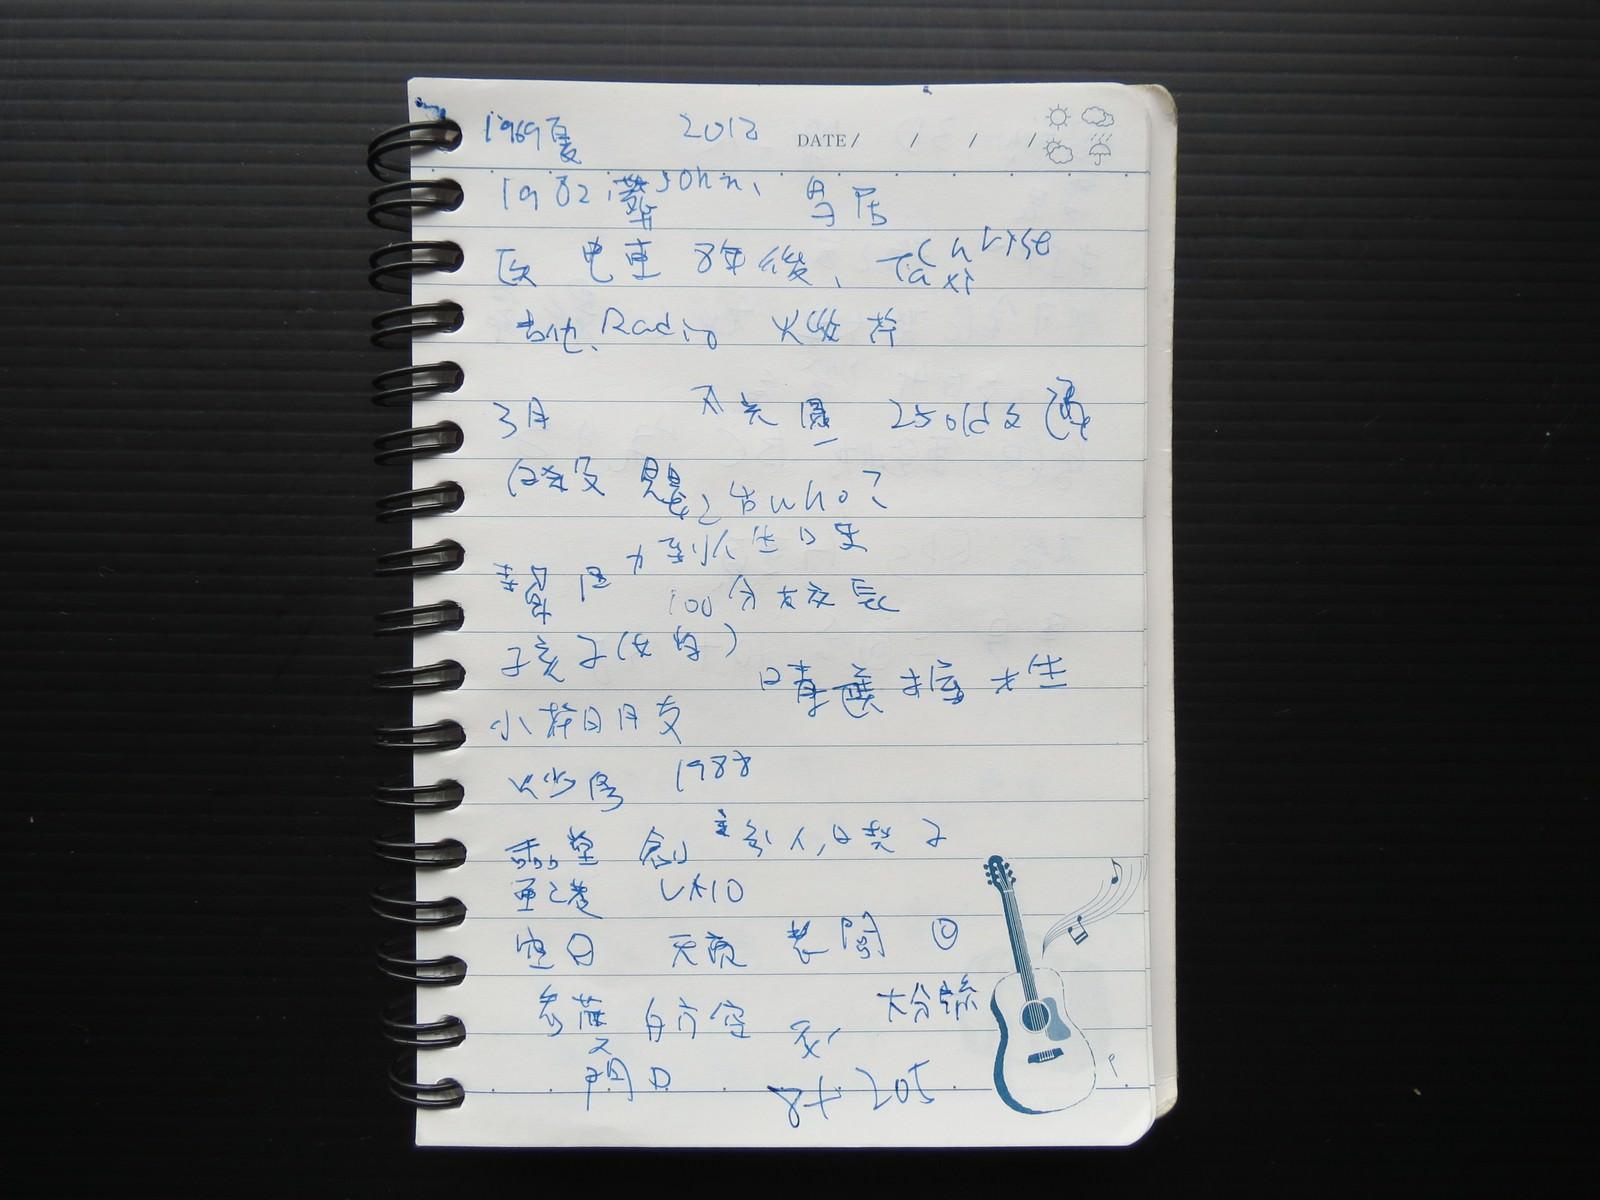 Movie, ナミヤ雑貨店の奇蹟(日本, 2017) / 解憂雜貨店(台灣.香港) / Miracles of the Namiya General Store(英文), 心得速記